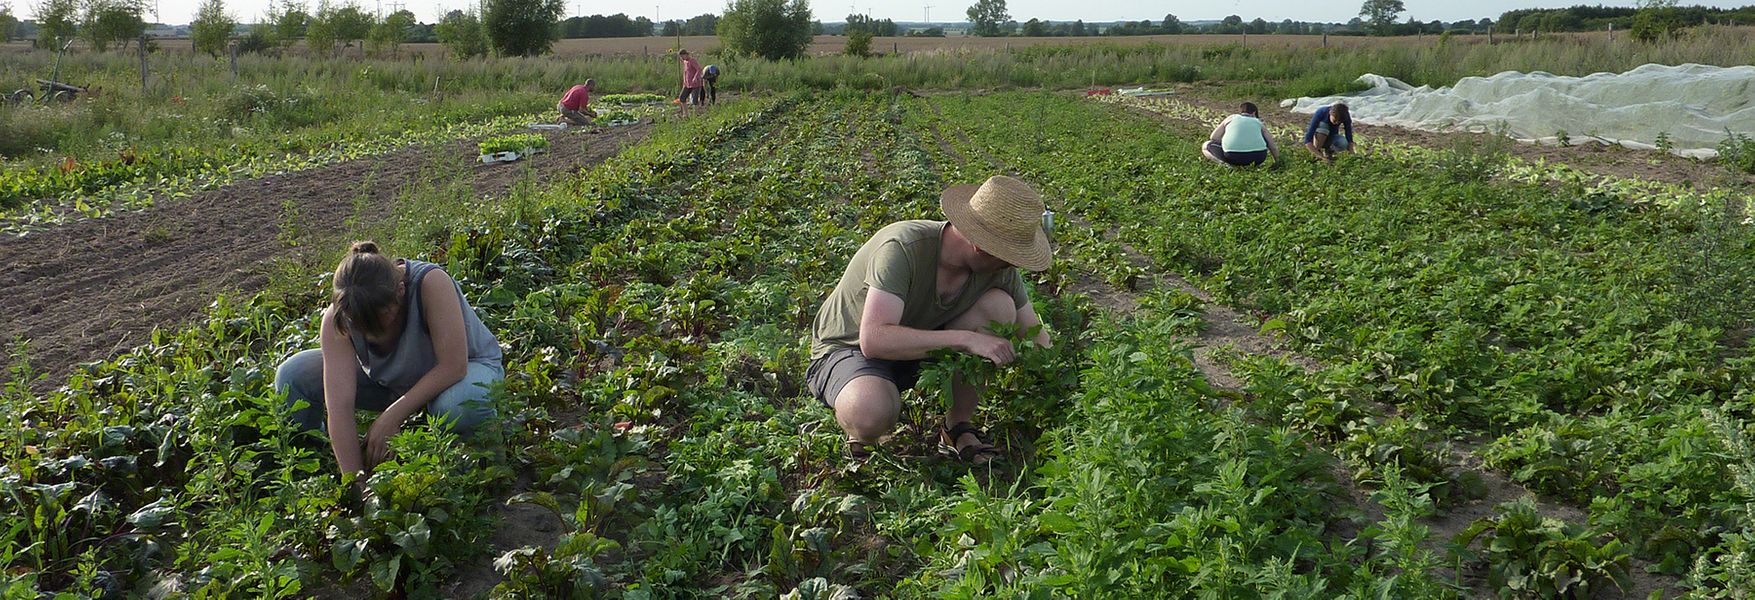 Organic Farming: Not Always So Environmentally Friendly